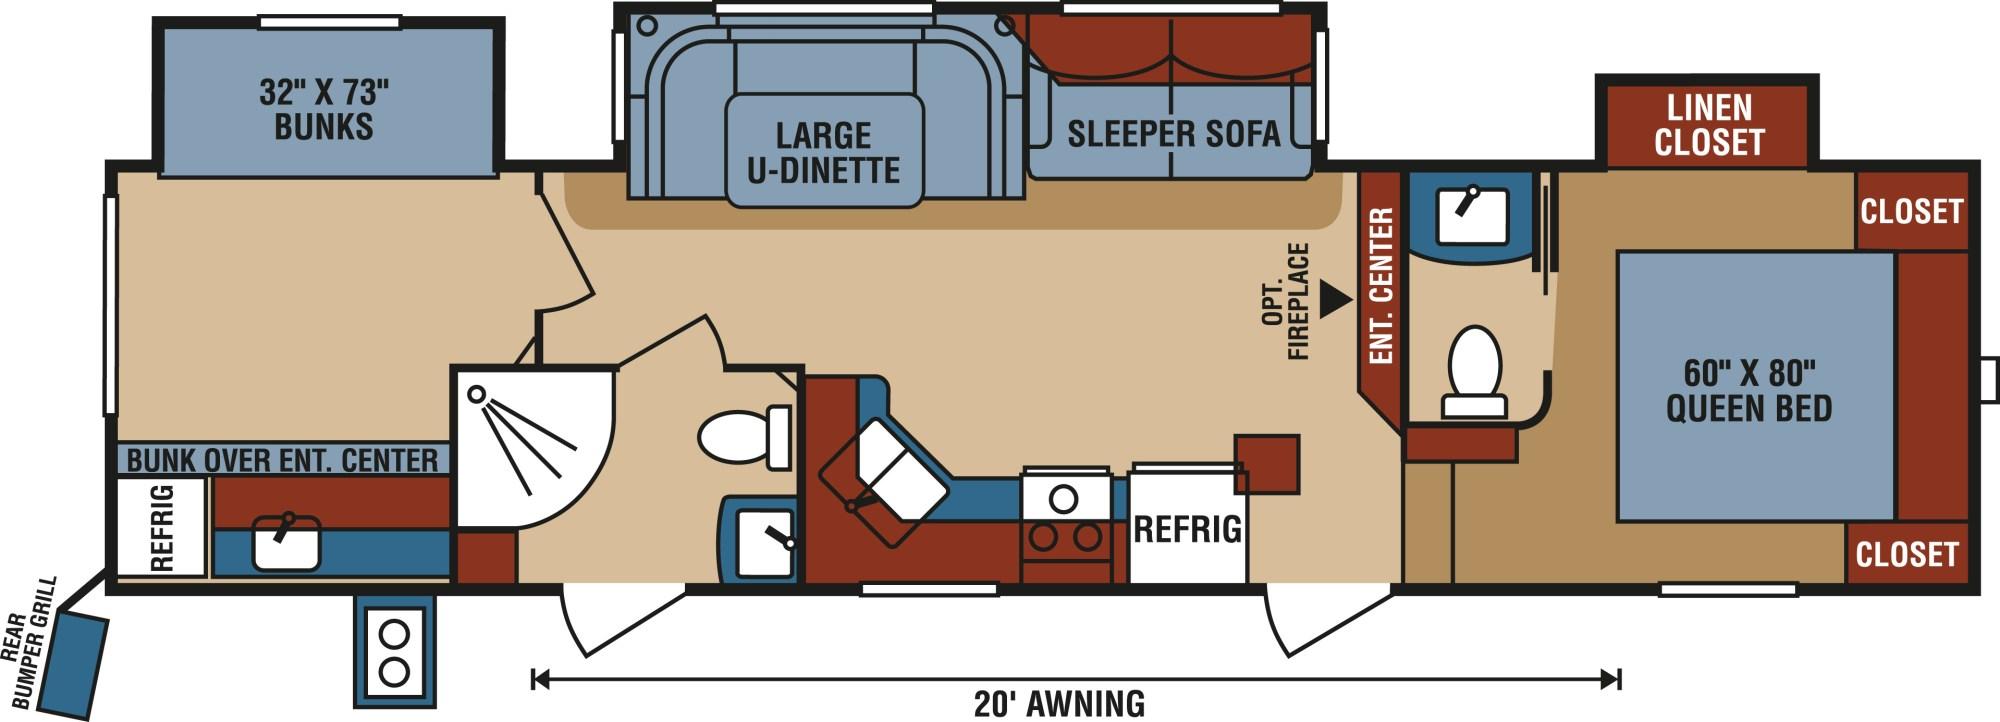 hight resolution of view floorplan